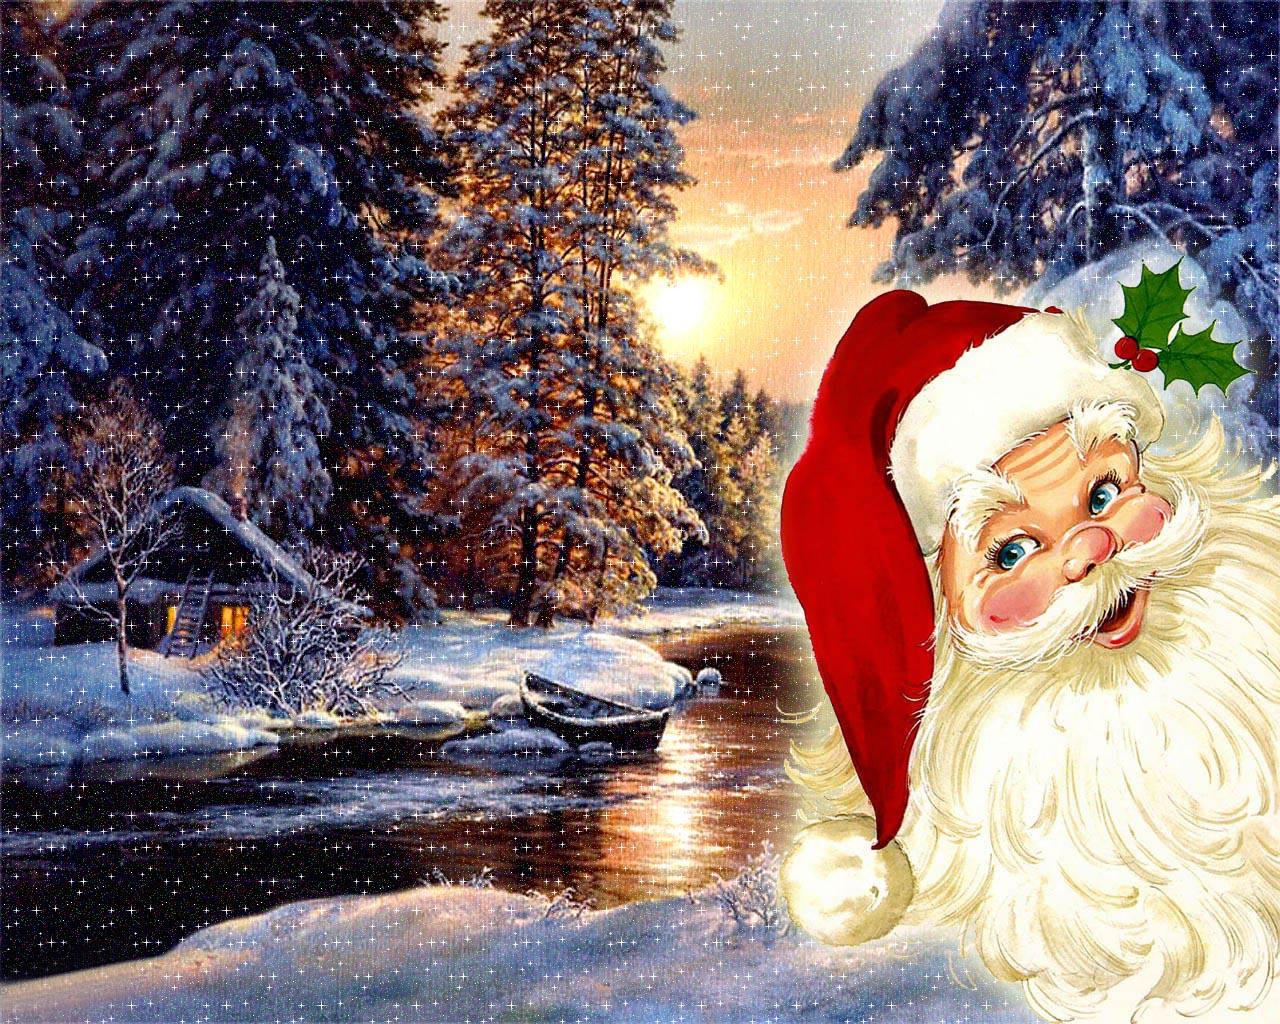 http://4.bp.blogspot.com/-lkP_GW8URdE/Tq_TQI_sbAI/AAAAAAAAP4A/soTRvIpGBsg/s1600/Mooie-kerstman-achtergronden-leuke-kerstman-wallpapers-afbeelding-plaatje-foto-28.jpg